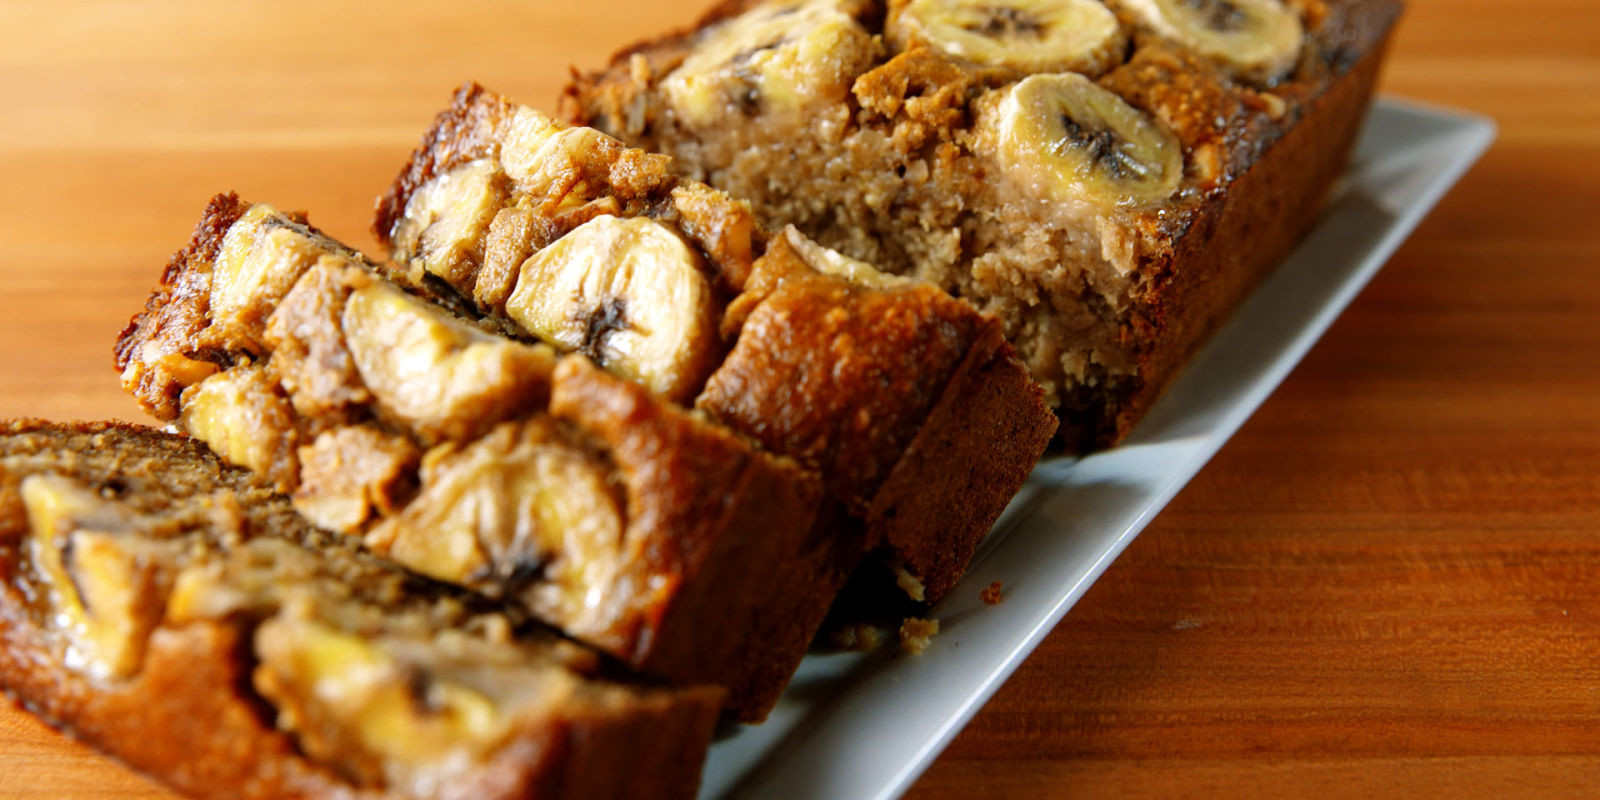 Gluten Free Banana Bread Recipe  Baking Gluten Free Banana Bread Video — Gluten Free Banana